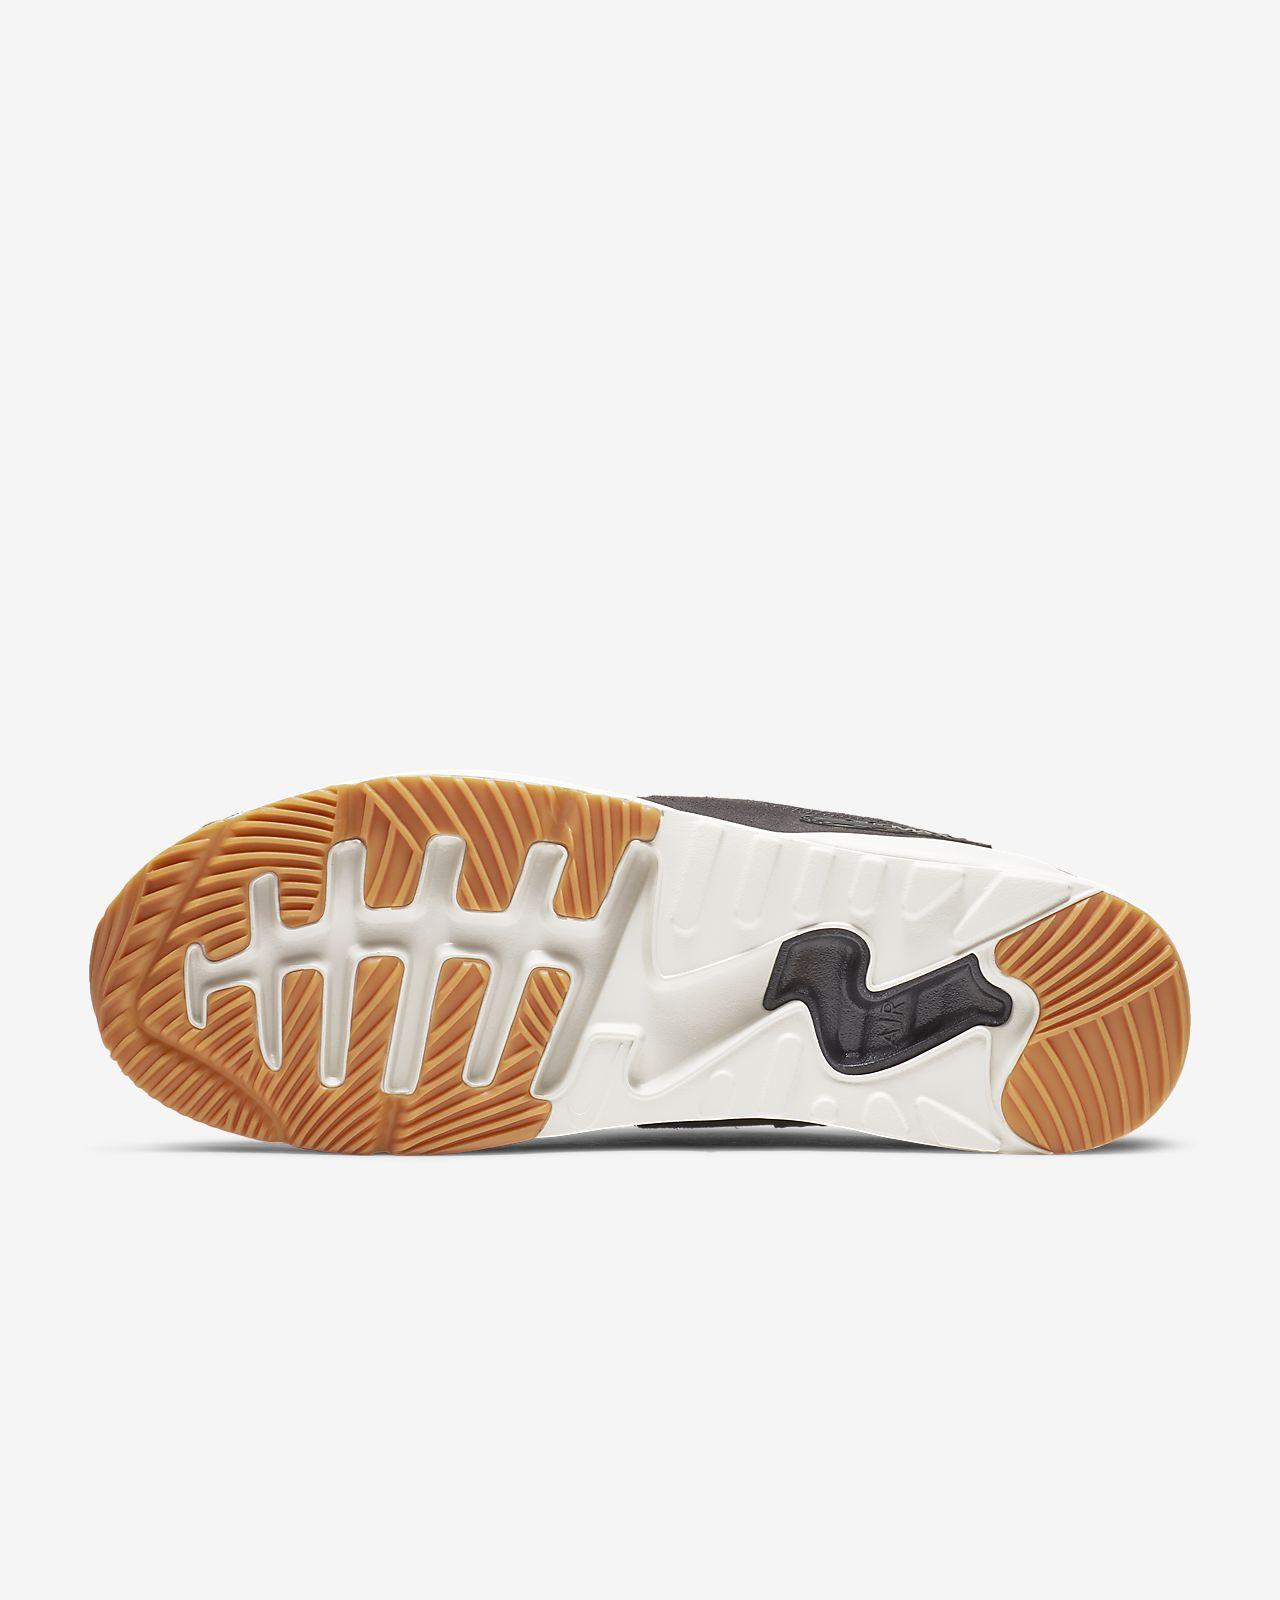 c5124639b82 Nike Air Max 90 Ultra 2.0 Men s Shoe. Nike.com NZ